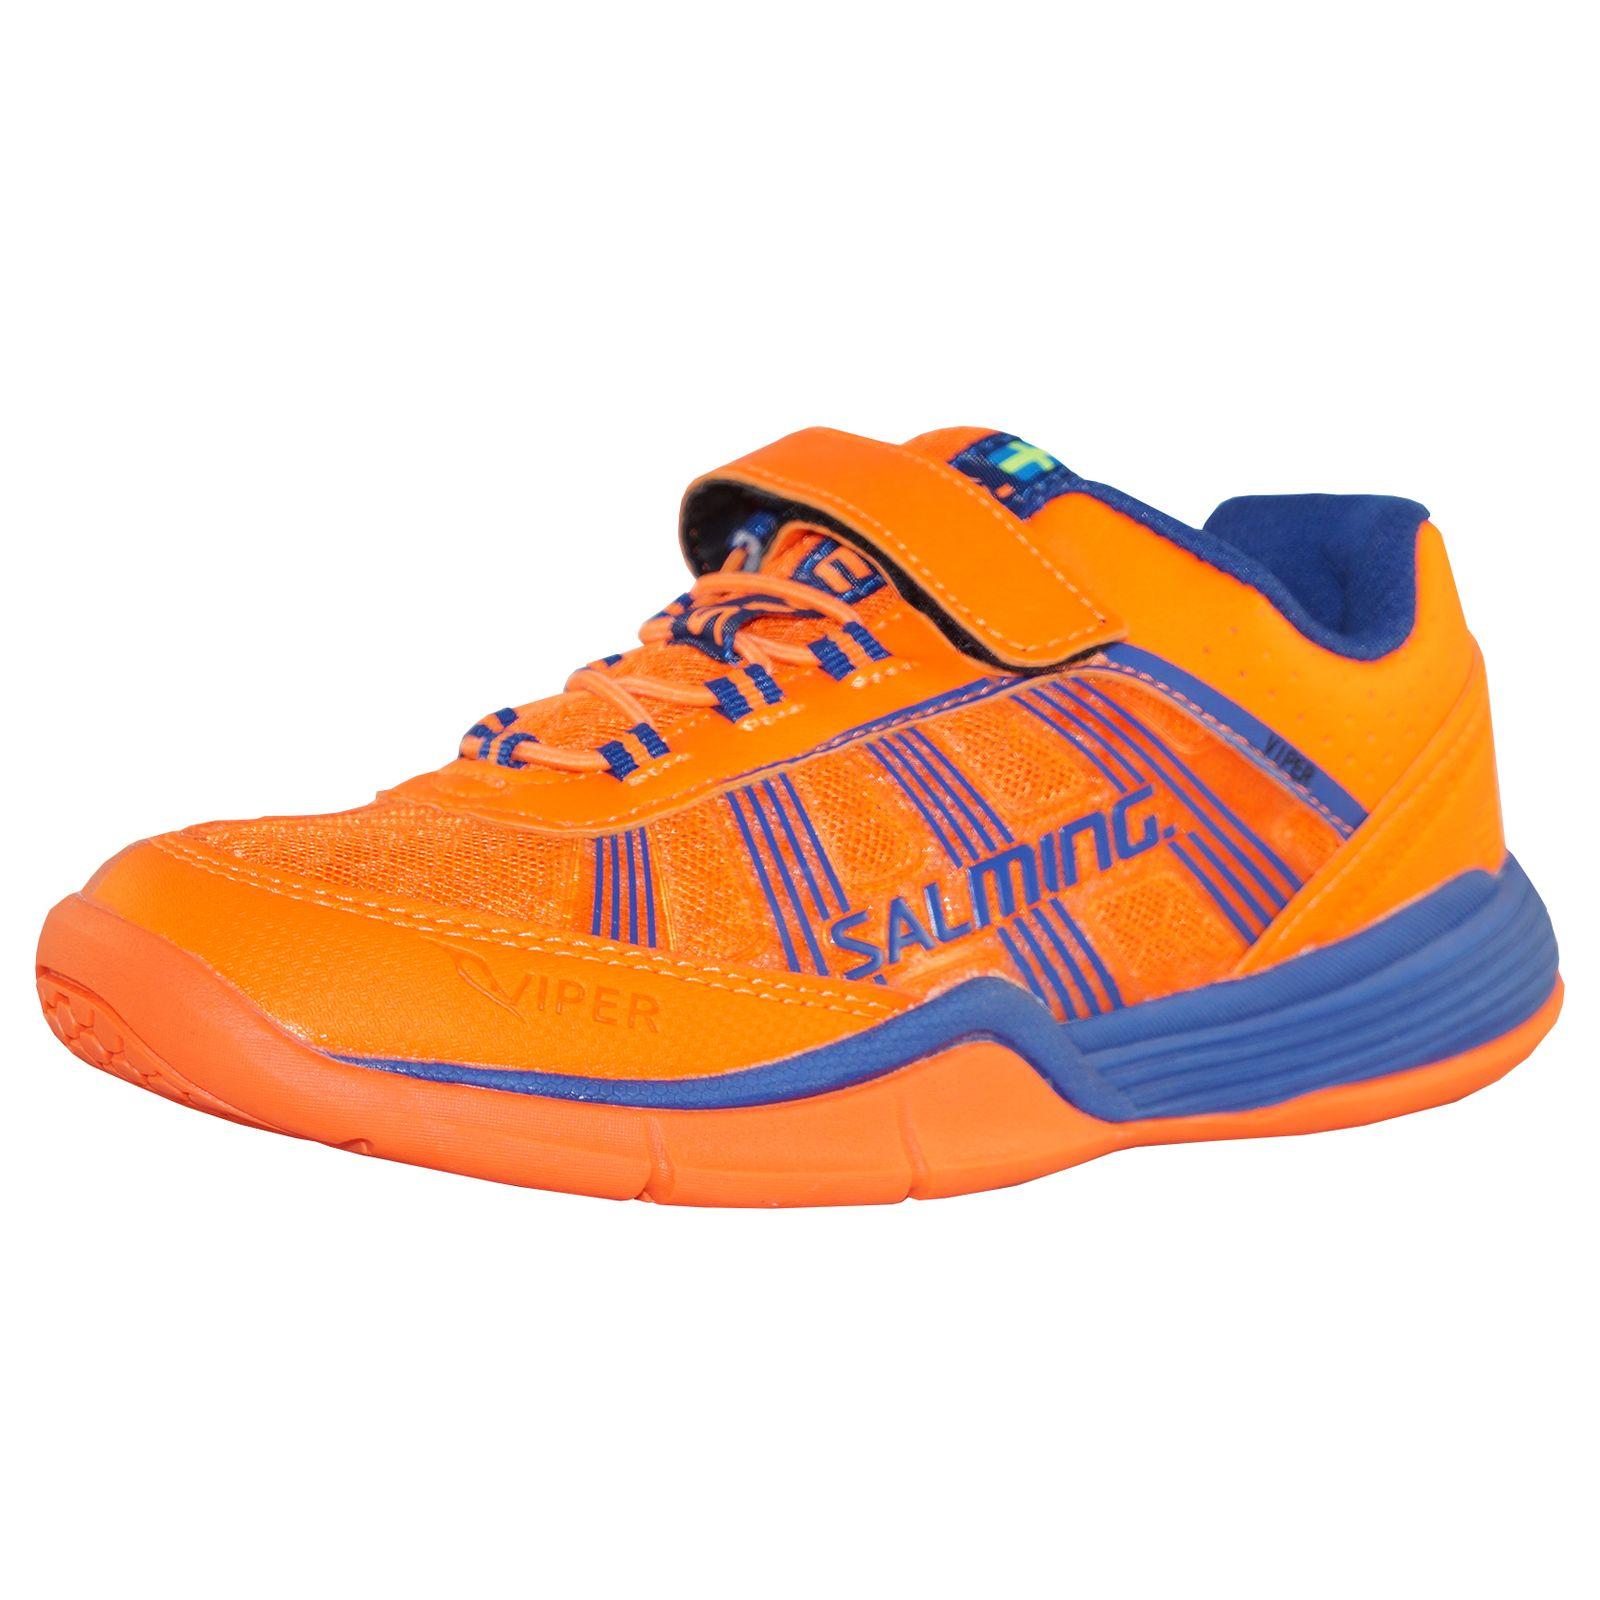 brand new 625e8 ce517 Salming Viper Kids Indoor Handballschuhe Hallenschuhe Kinderschuhe  orange/blau